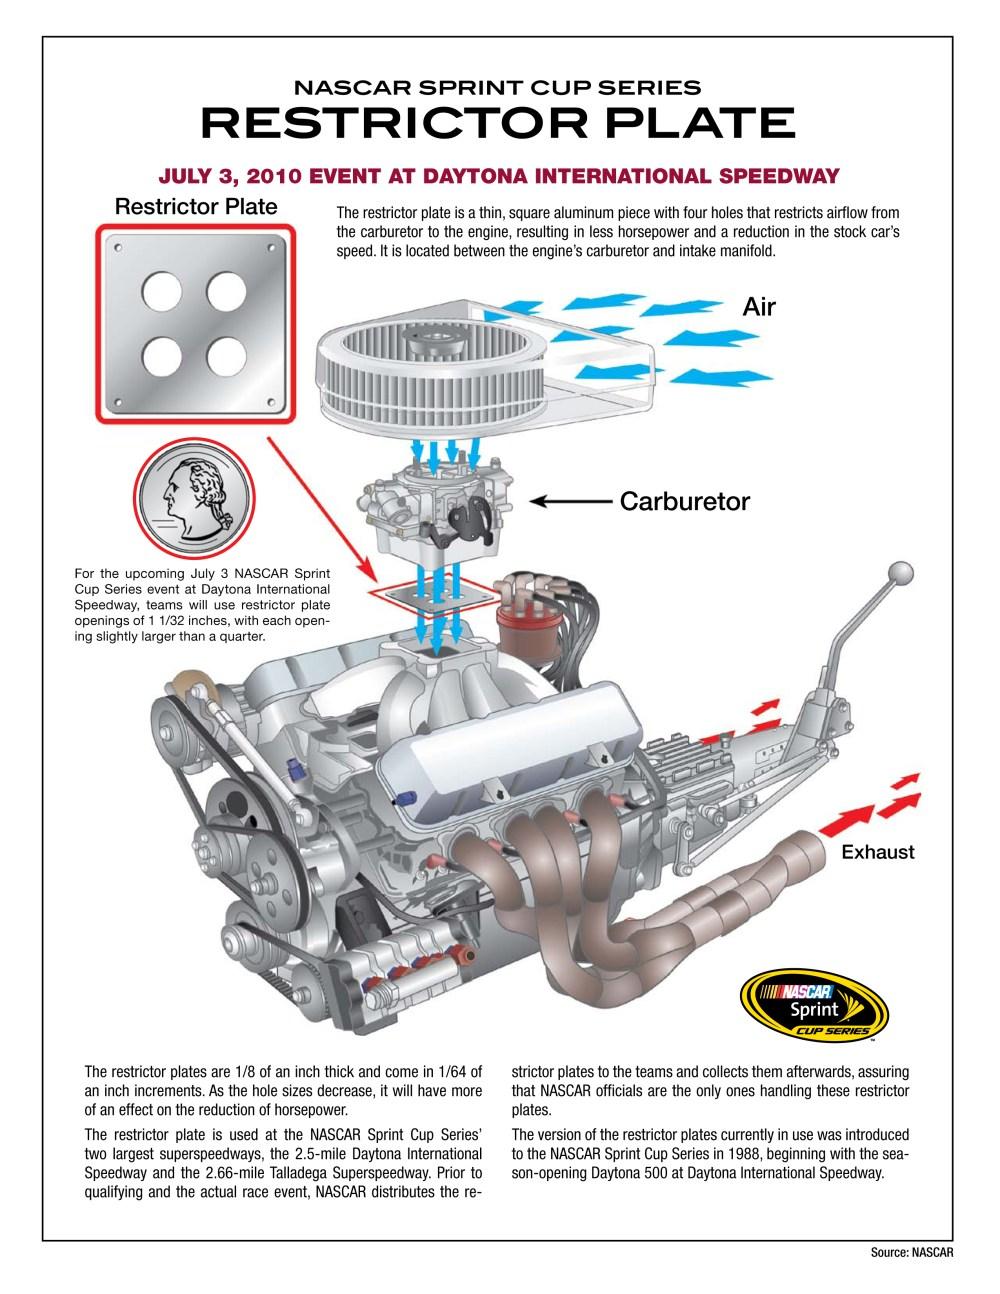 medium resolution of nascar engine diagram schema wiring diagrams jimmie johnson nascar coloring sheets nascar announces change in carburetor